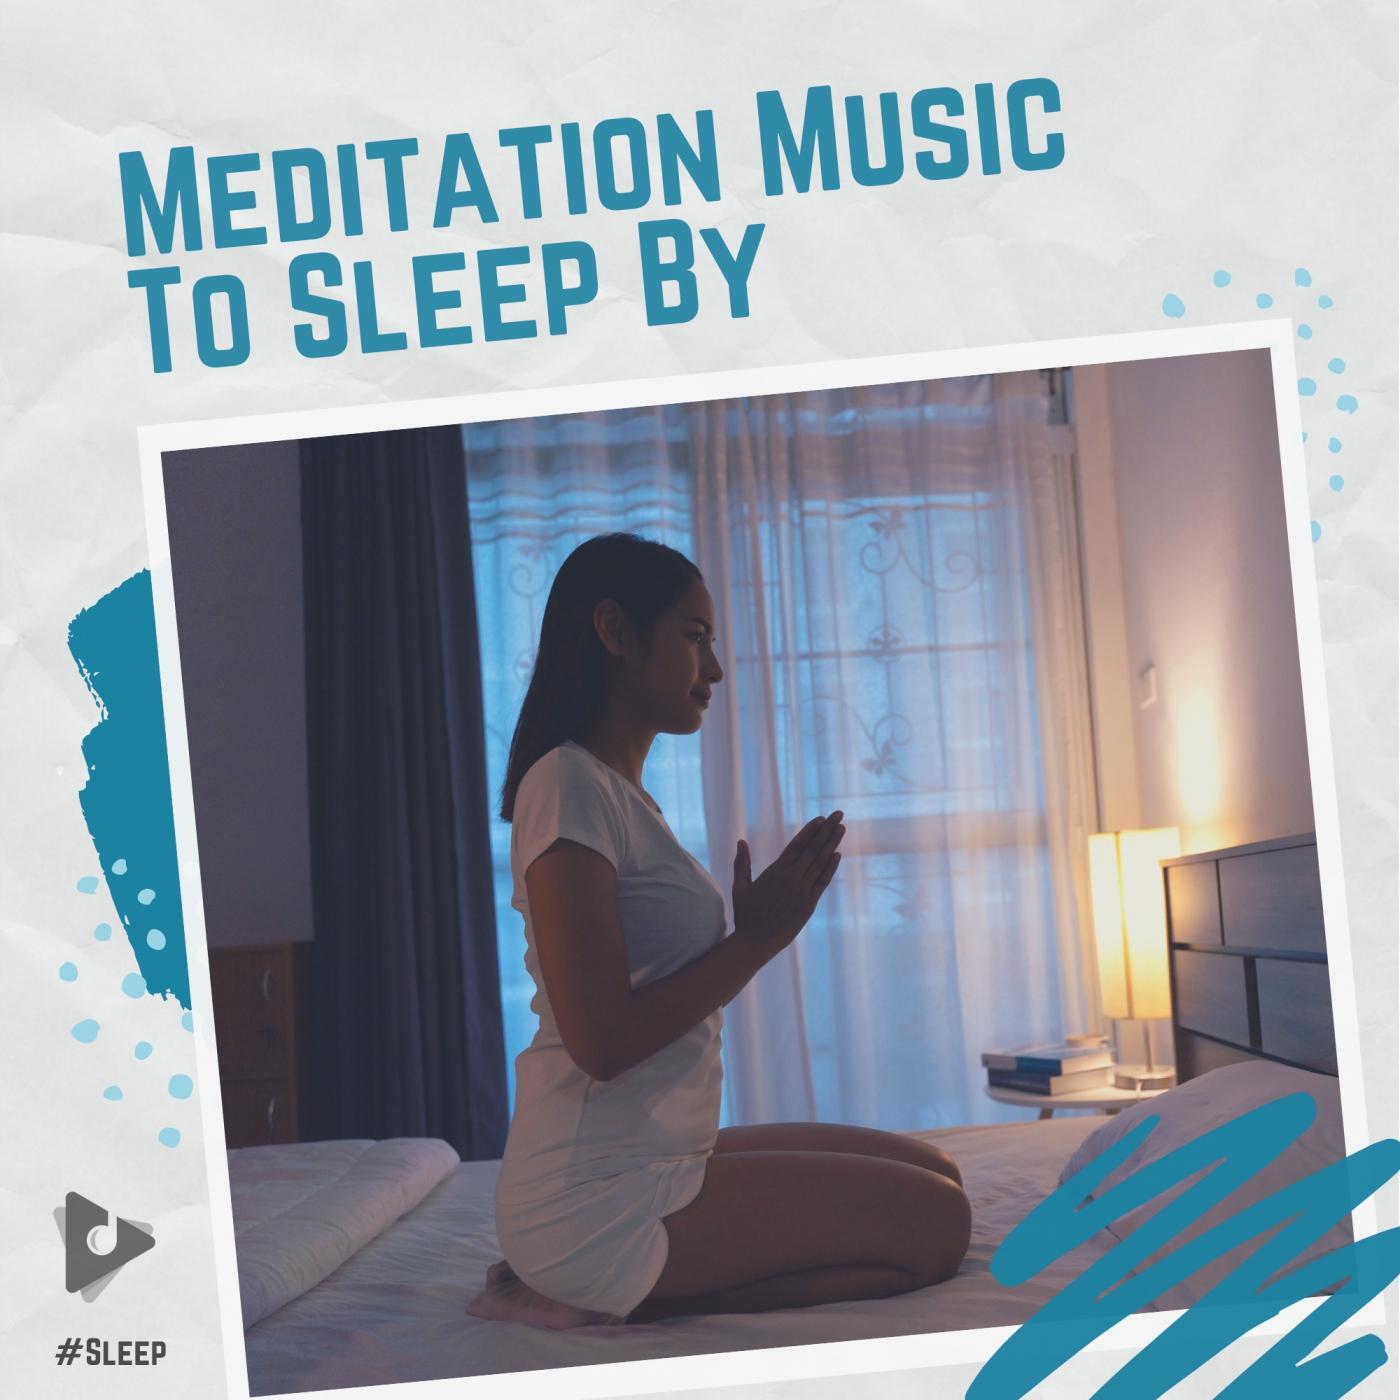 Meditation Music To Sleep By